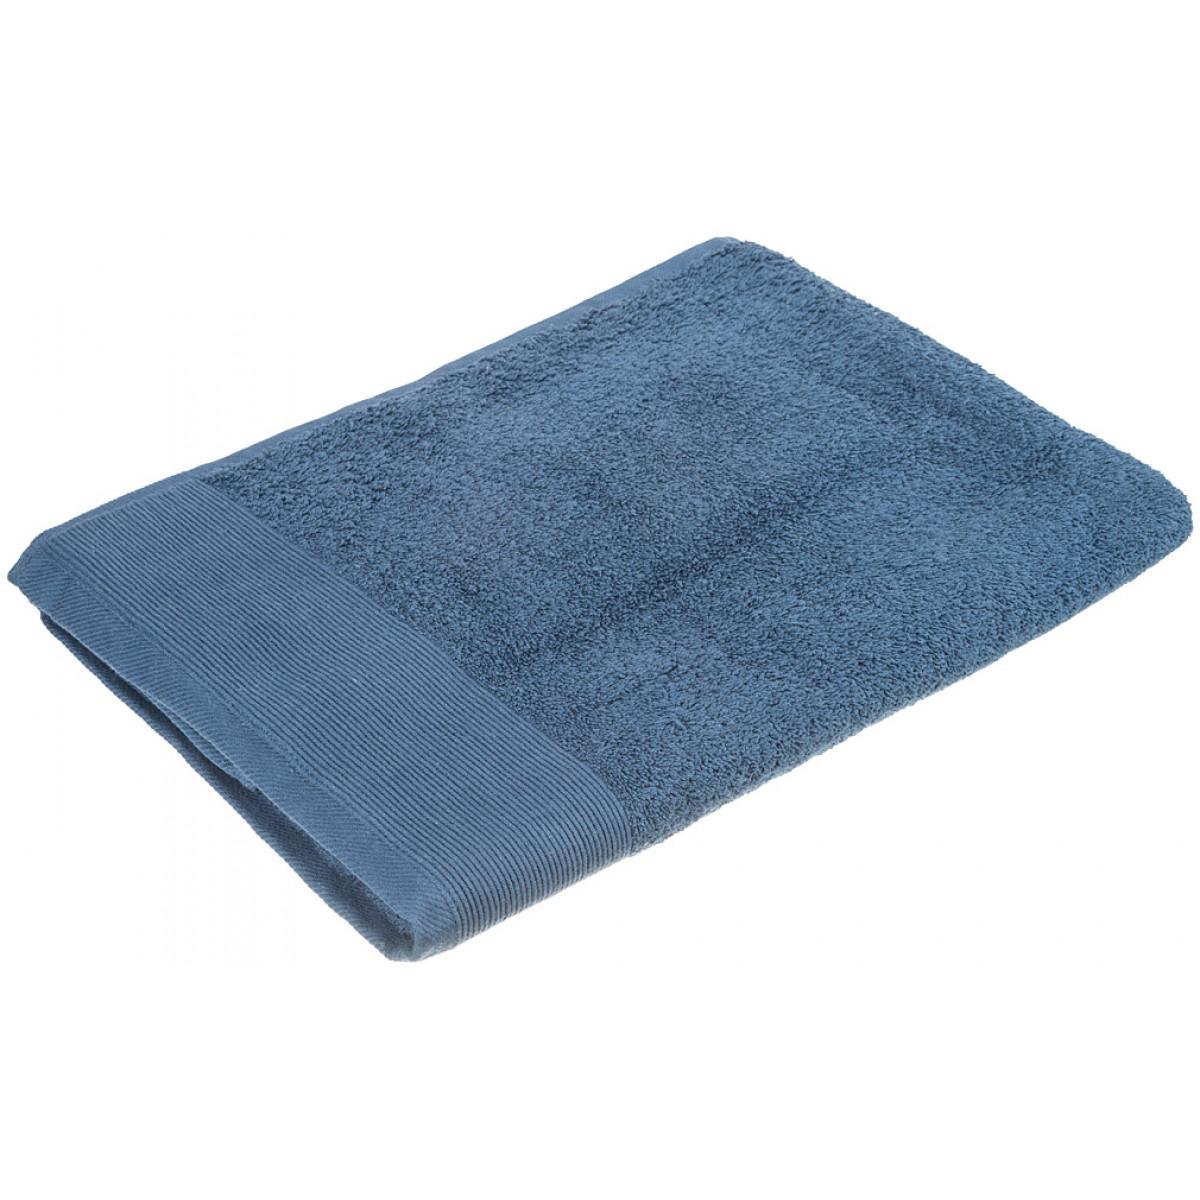 Полотенца Santalino Полотенце Elanor  (70х140 см) полотенца tango полотенце jackie 70х140 см